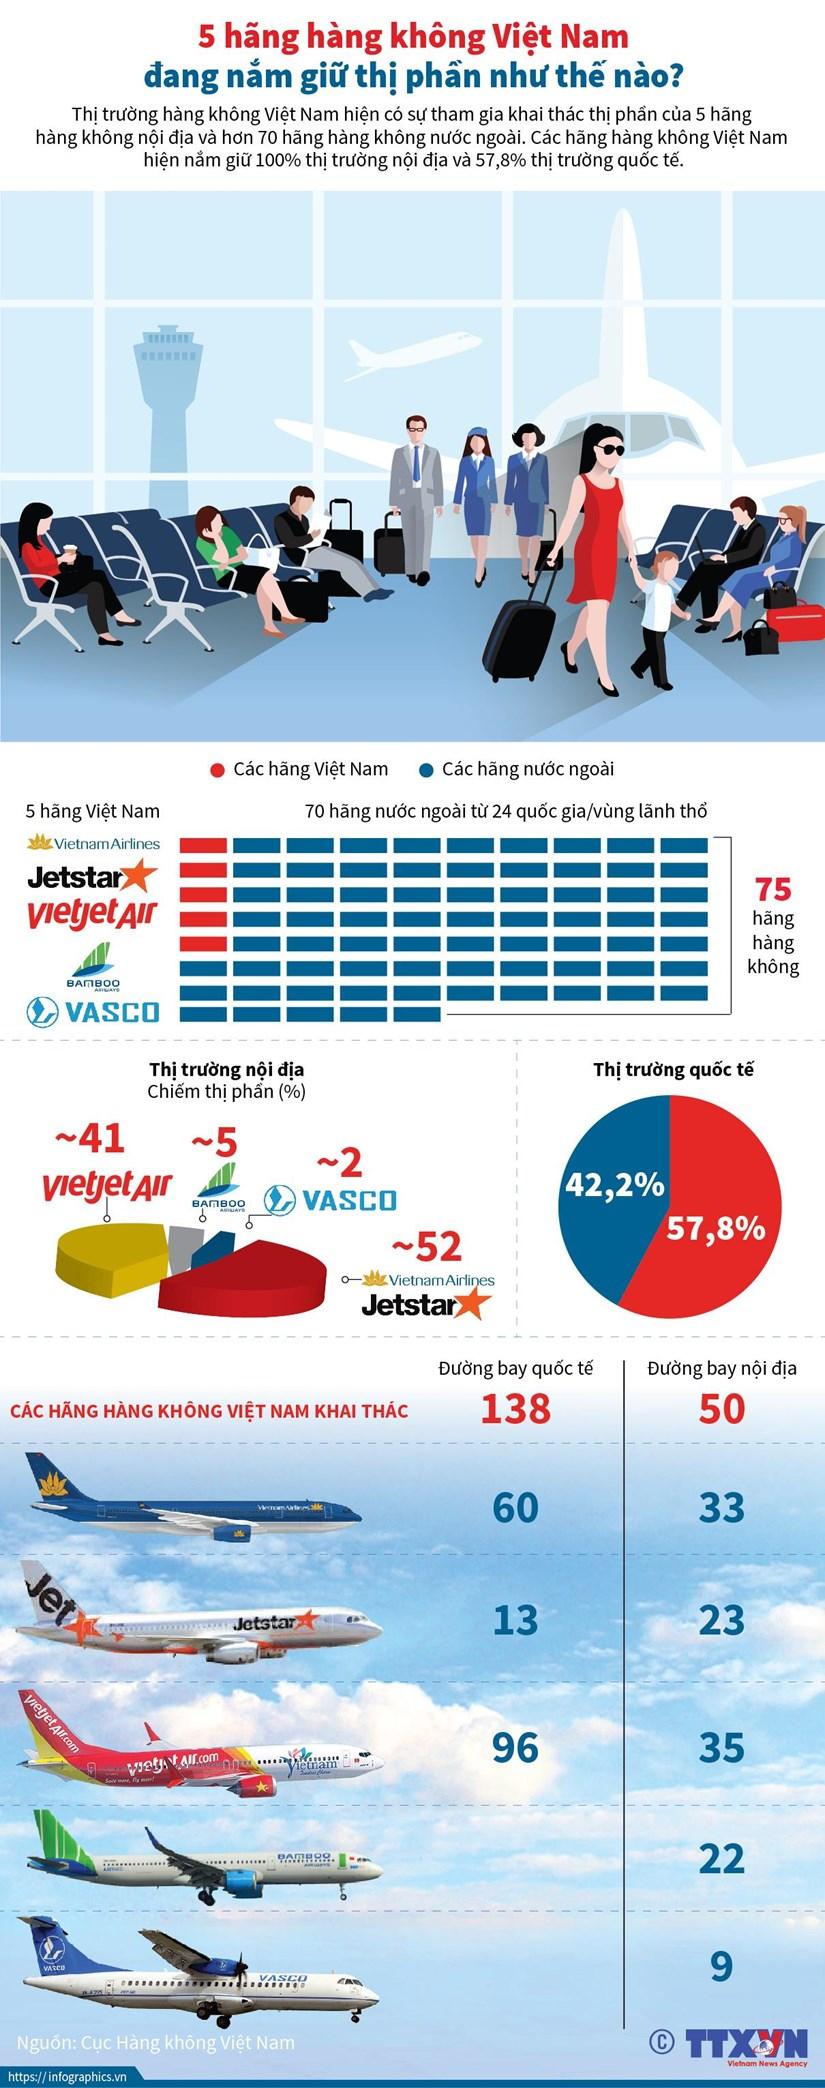 [Infographics] Thi phan cua 5 hang hang khong Viet Nam tai noi dia hinh anh 1